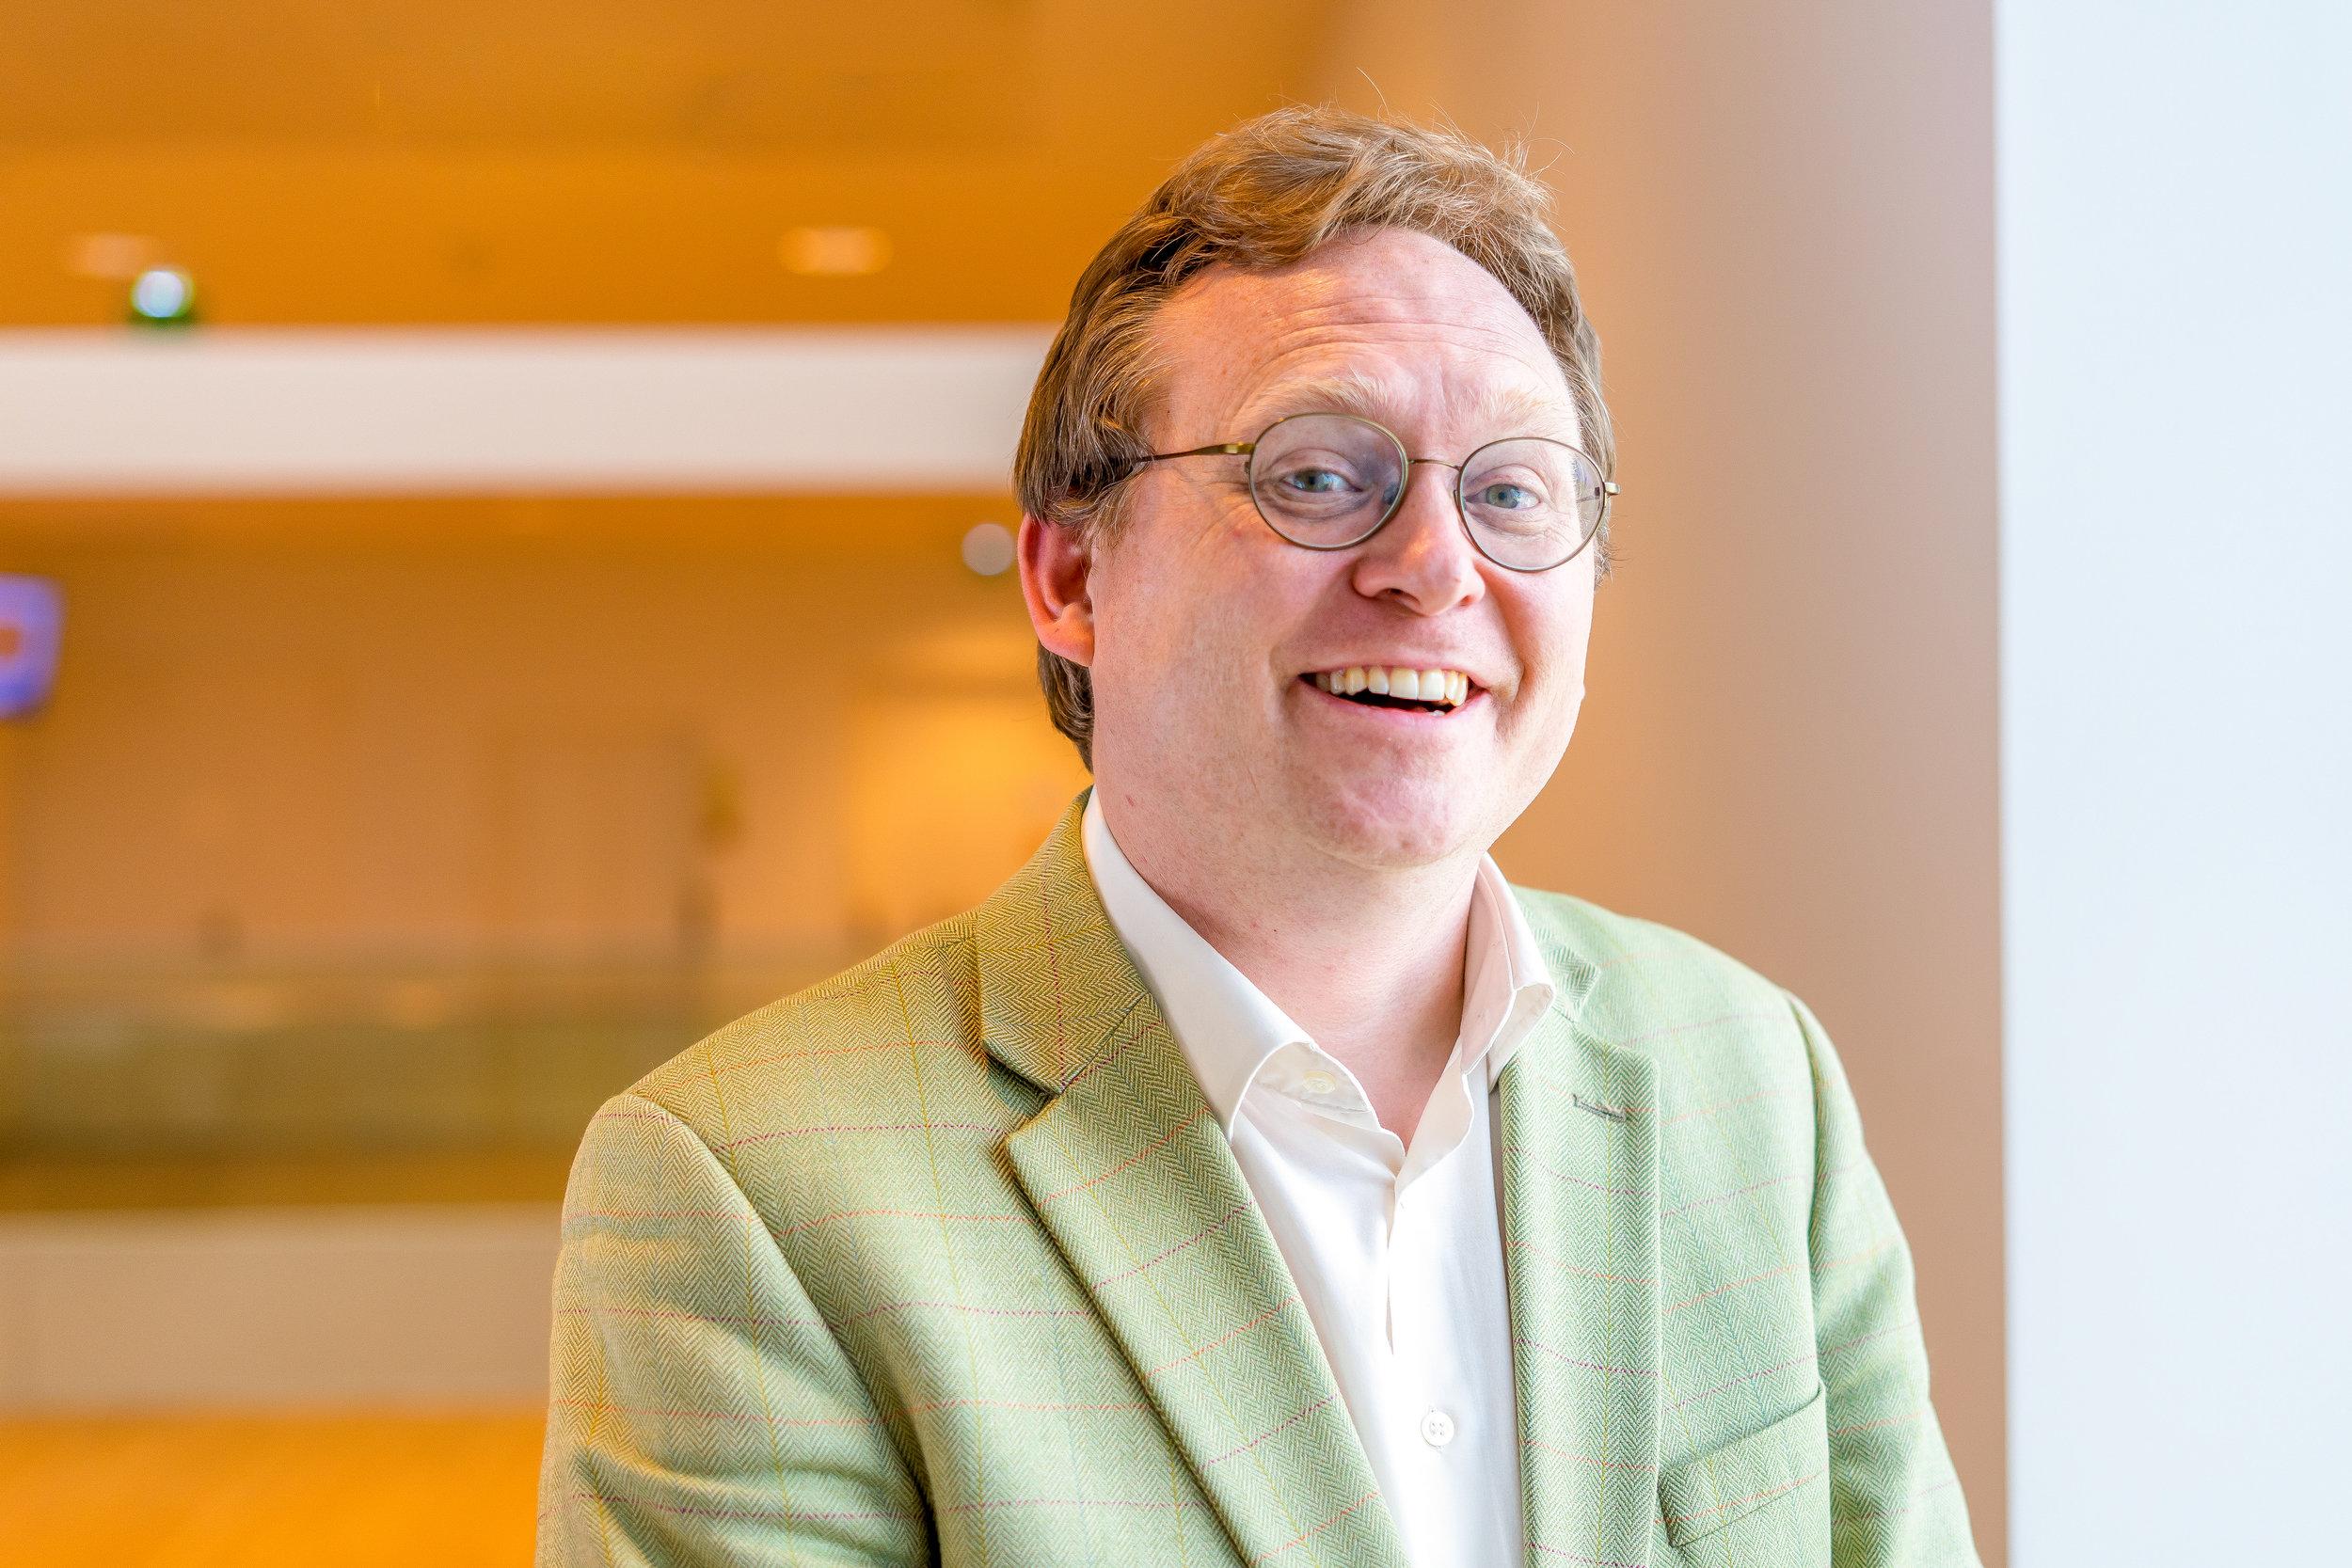 Robert Hadfield - Professor of Photonics (Electronic & Nanoscale Engineering)The University of Glasgow